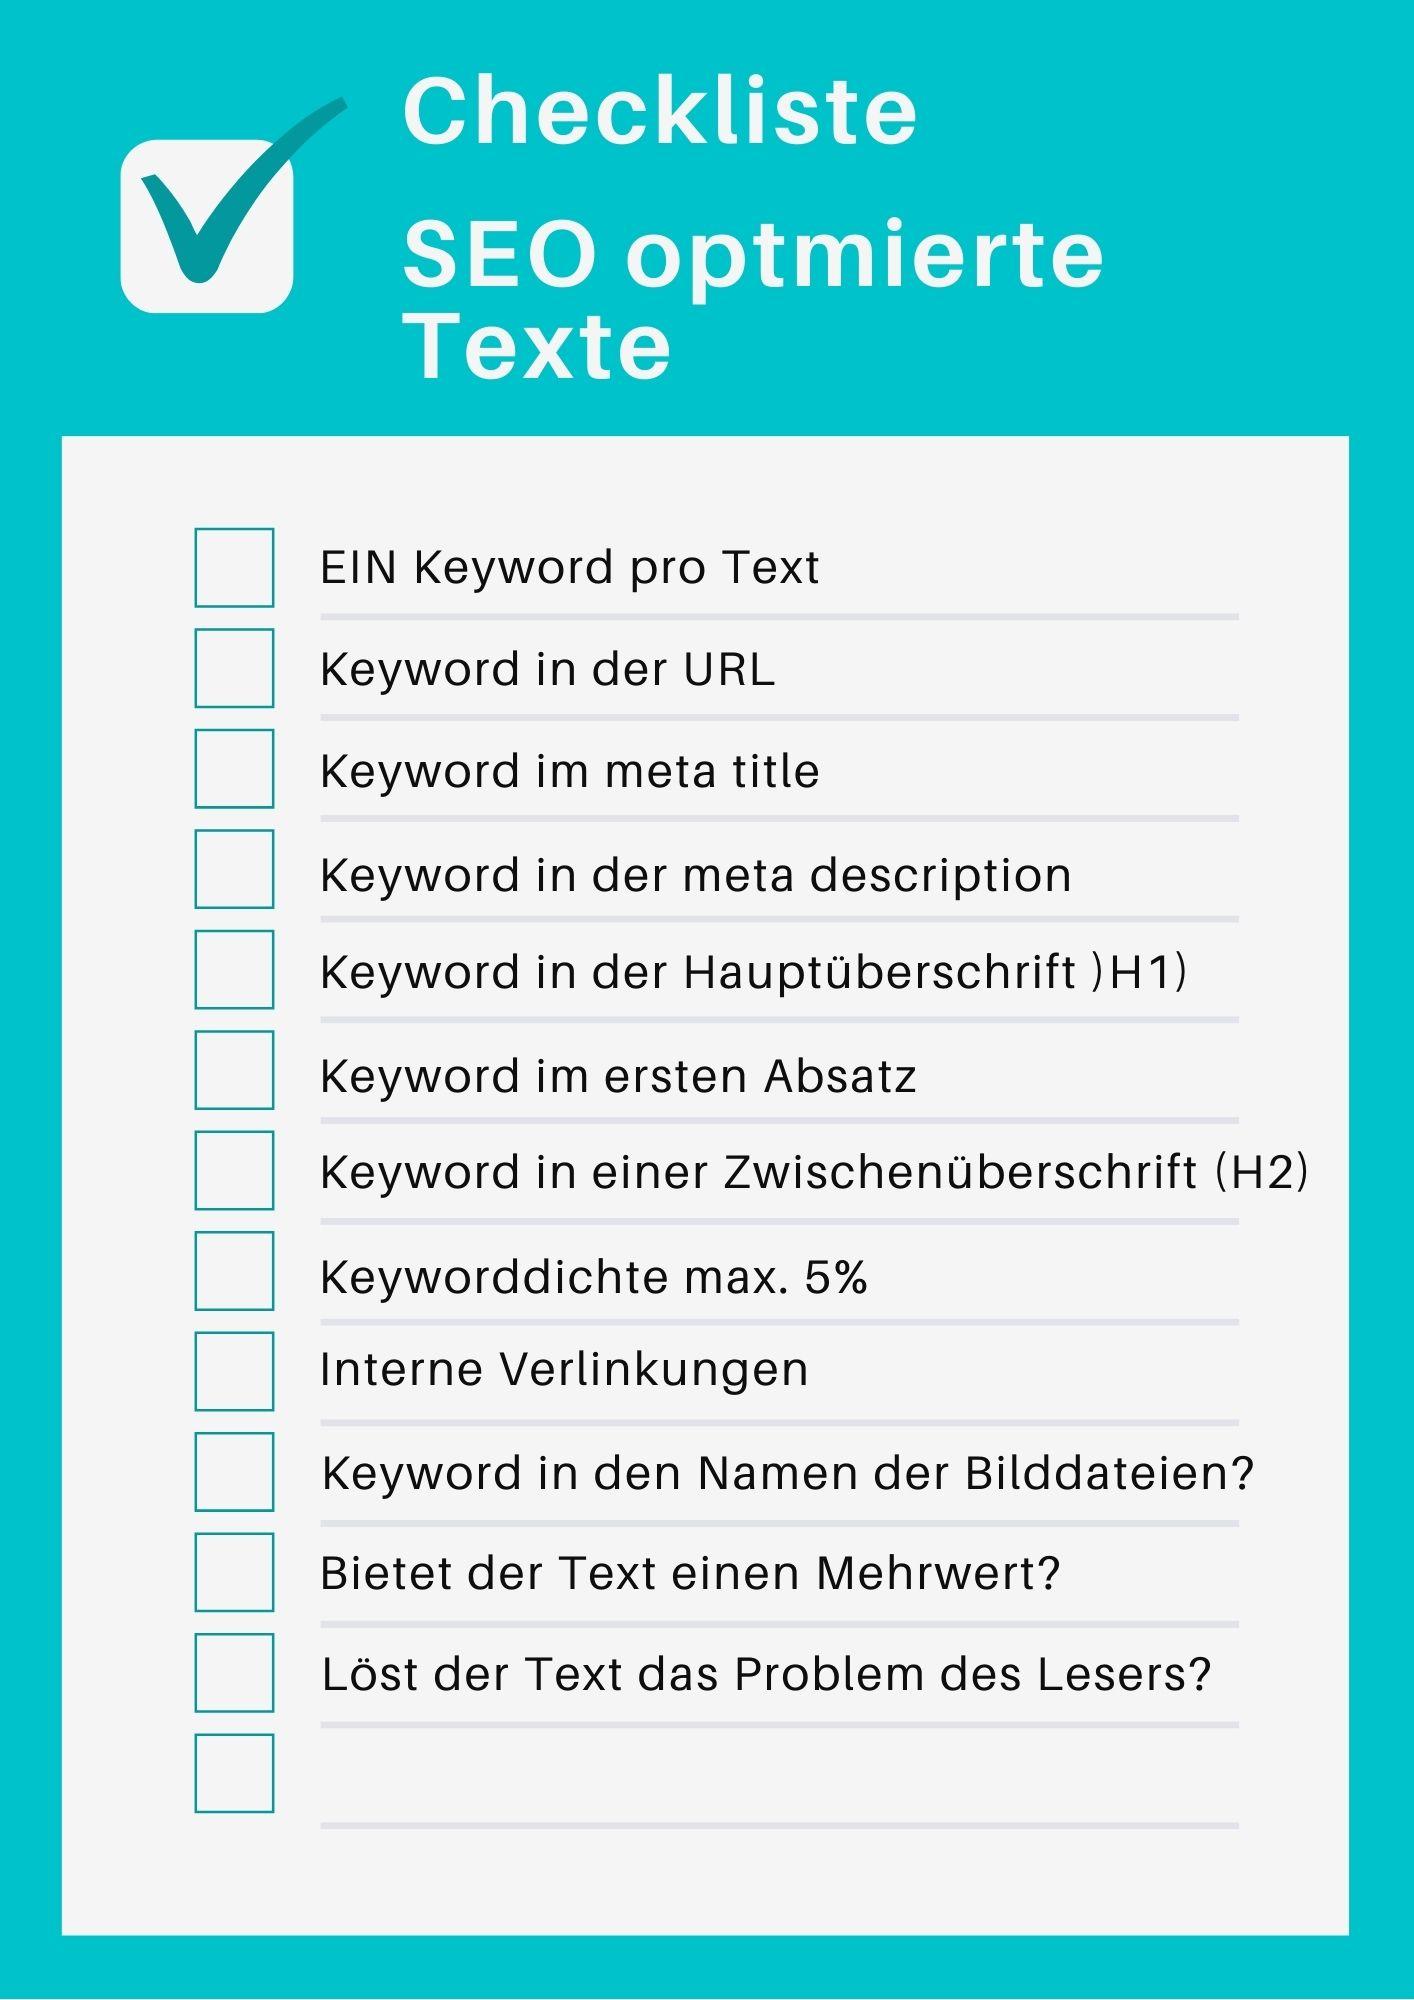 Checkliste für SEO optimierte Texte